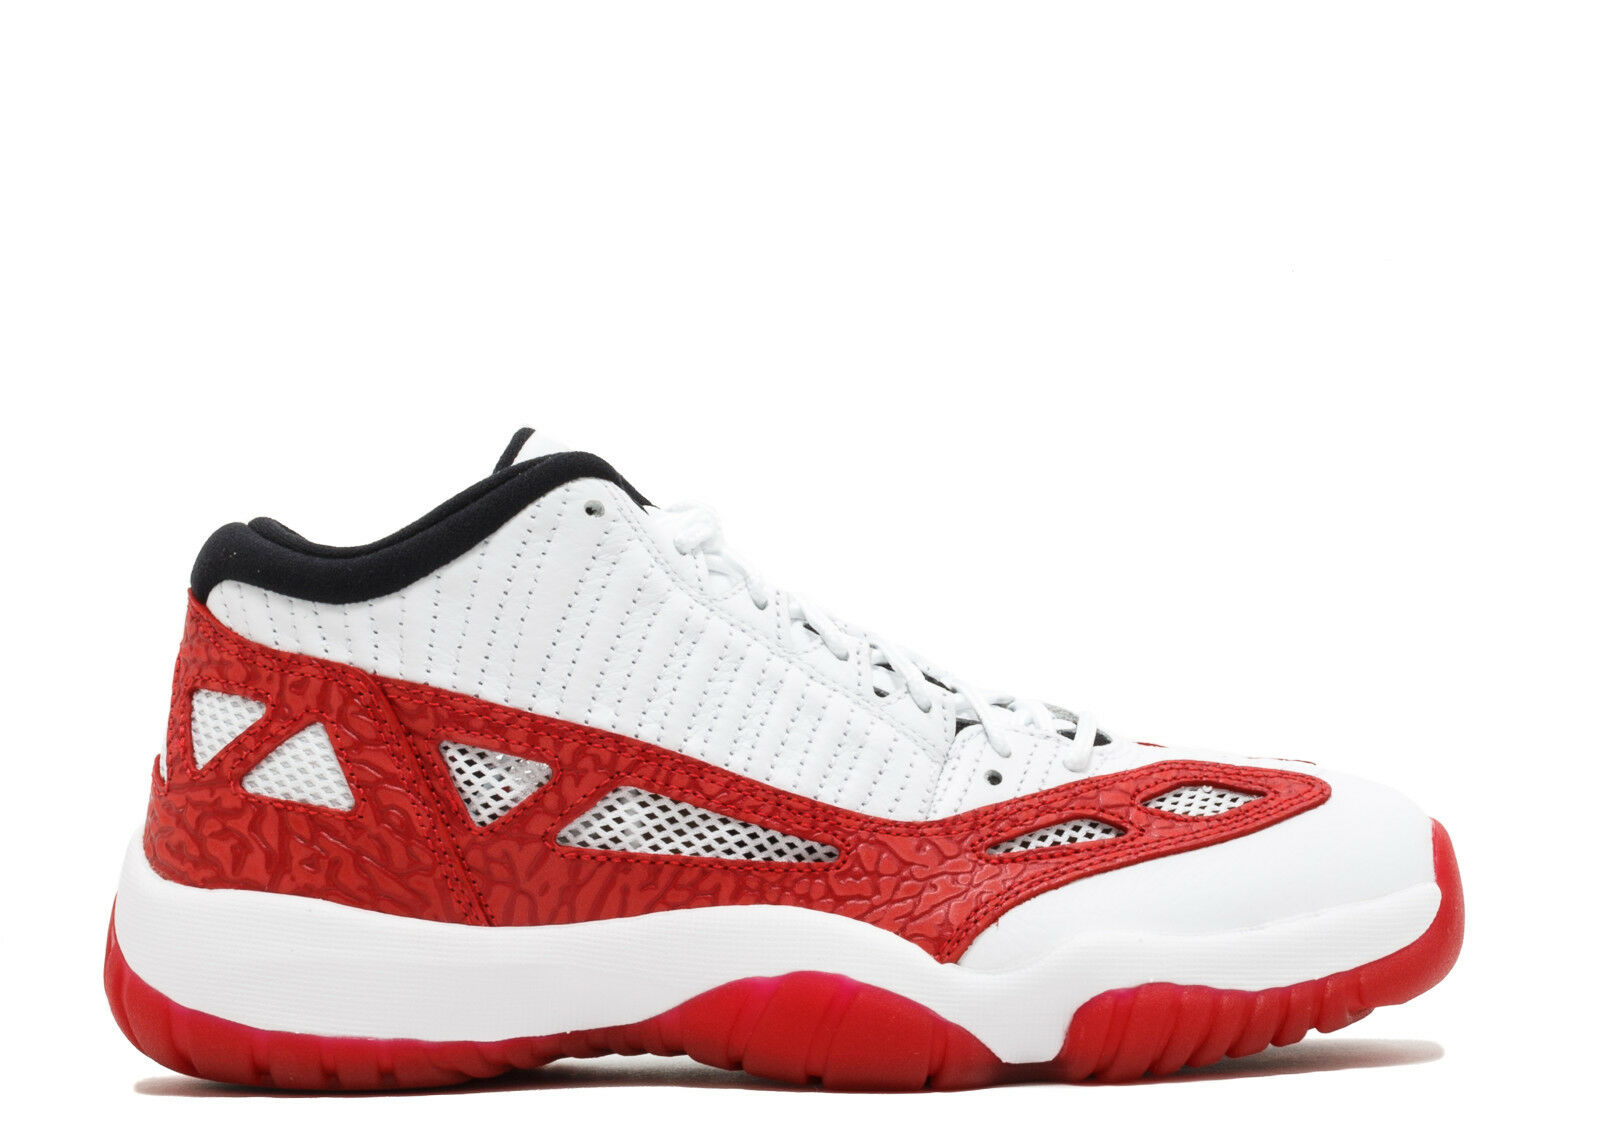 SALE Air Jordan Retro 11 Low IE White Gym Red Black 919172-101